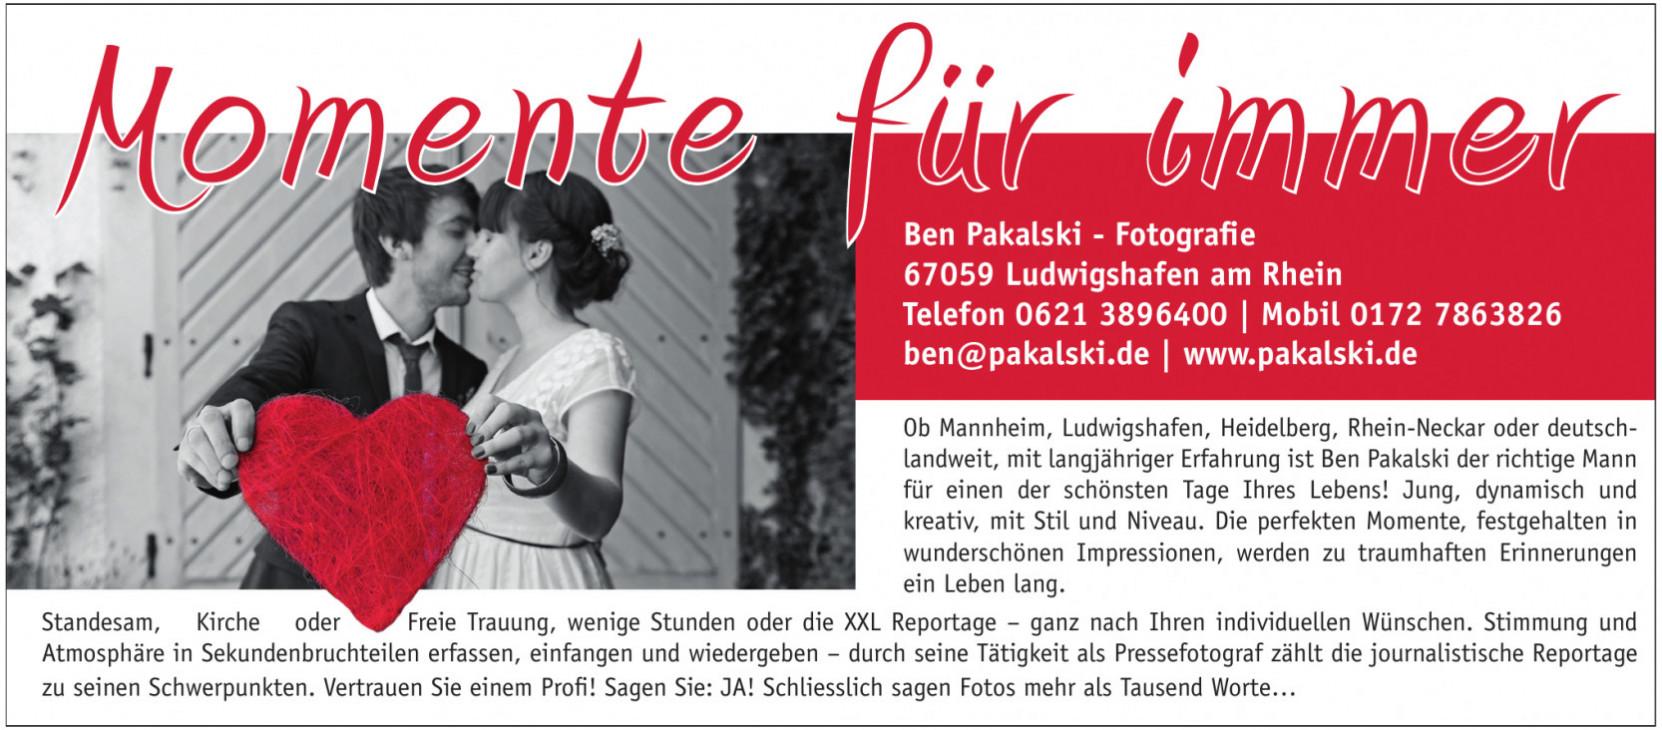 Ben Pakalski - Fotografie